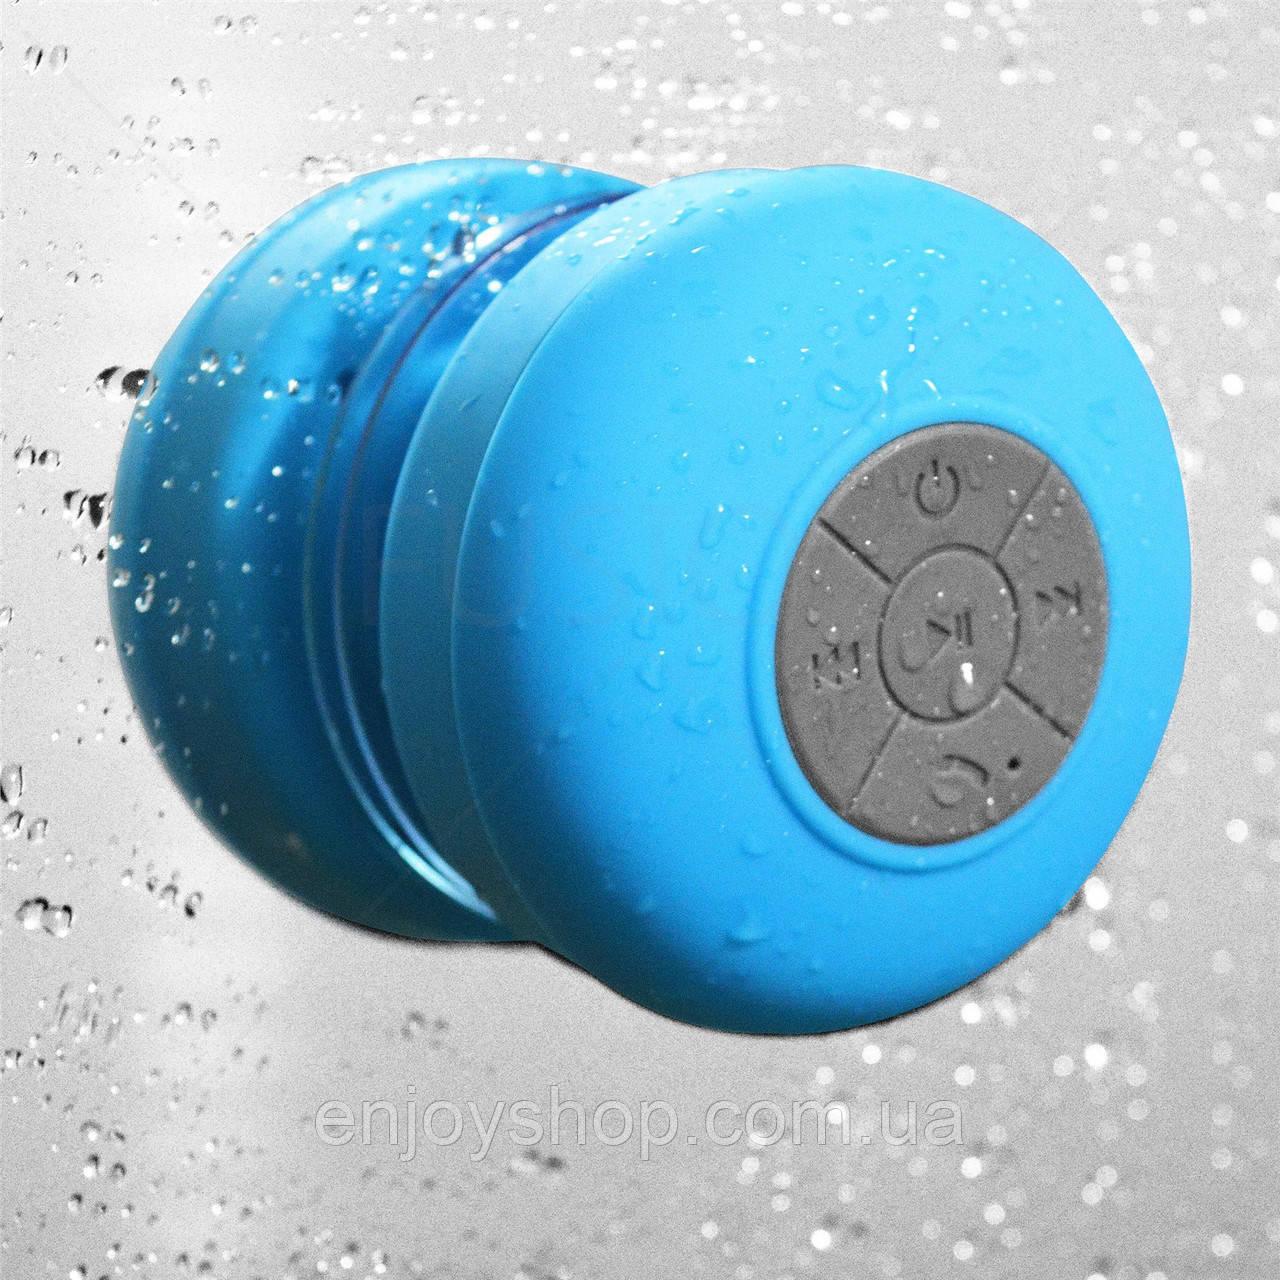 Блютуз Колонка SPS X1 waterproof (водонепроницаемая) на присоске